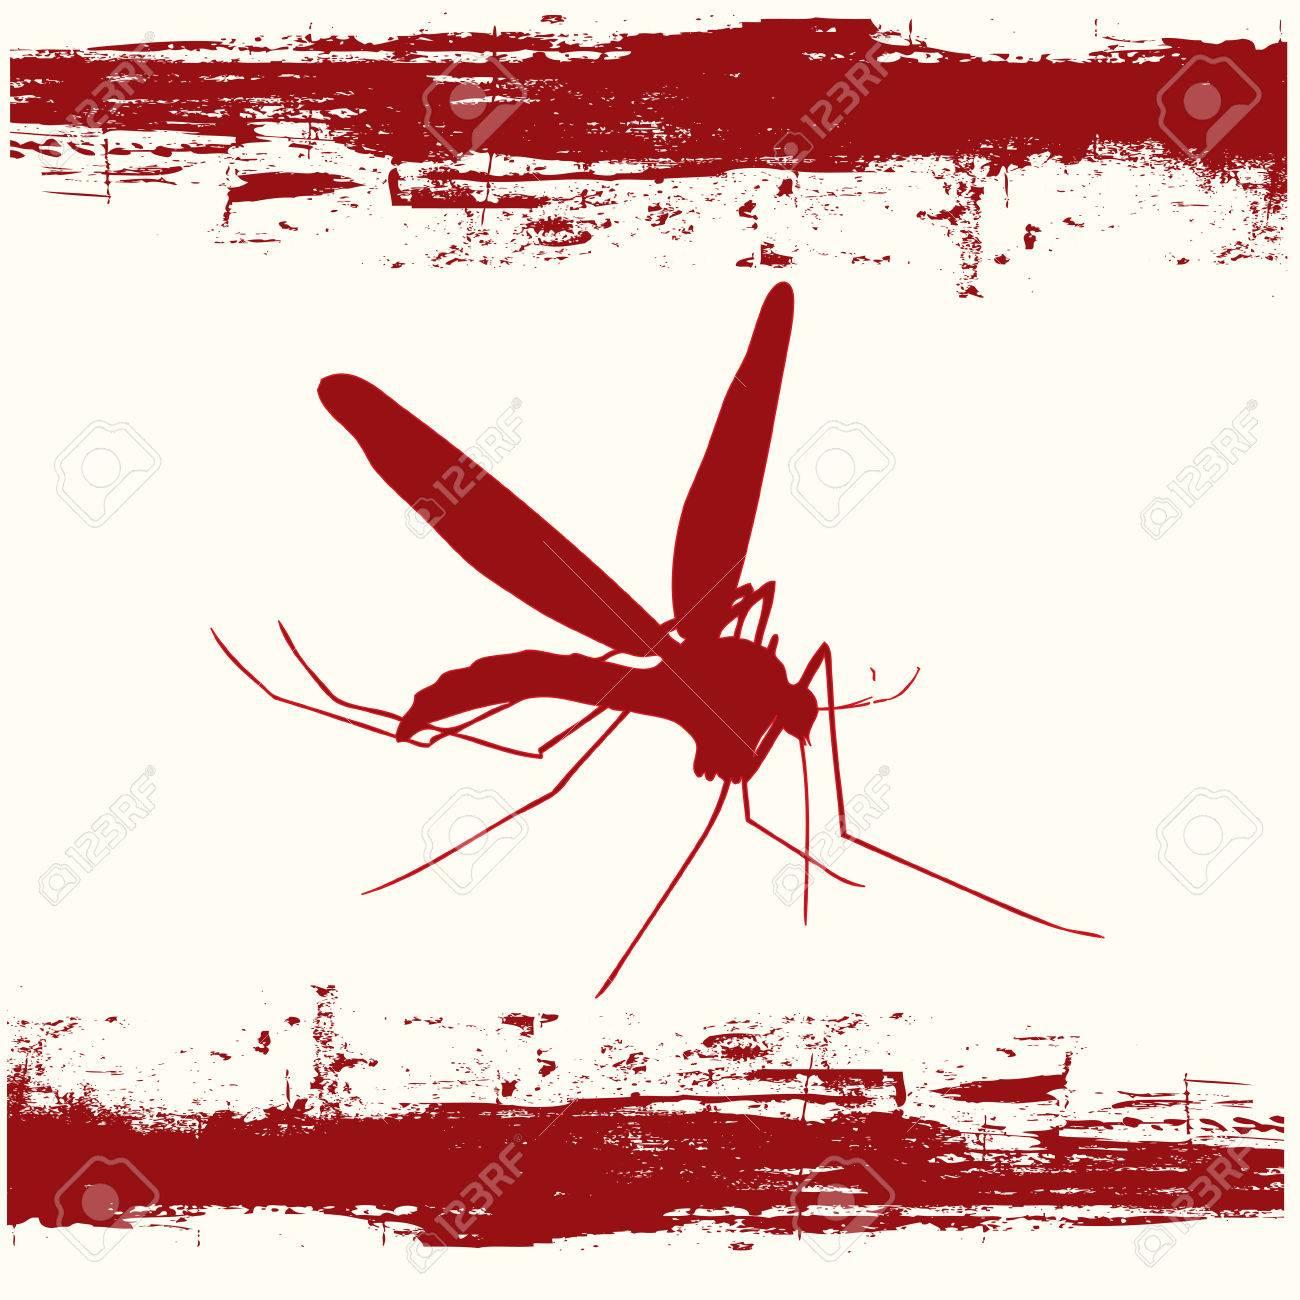 Mosquito Danger - 5023317